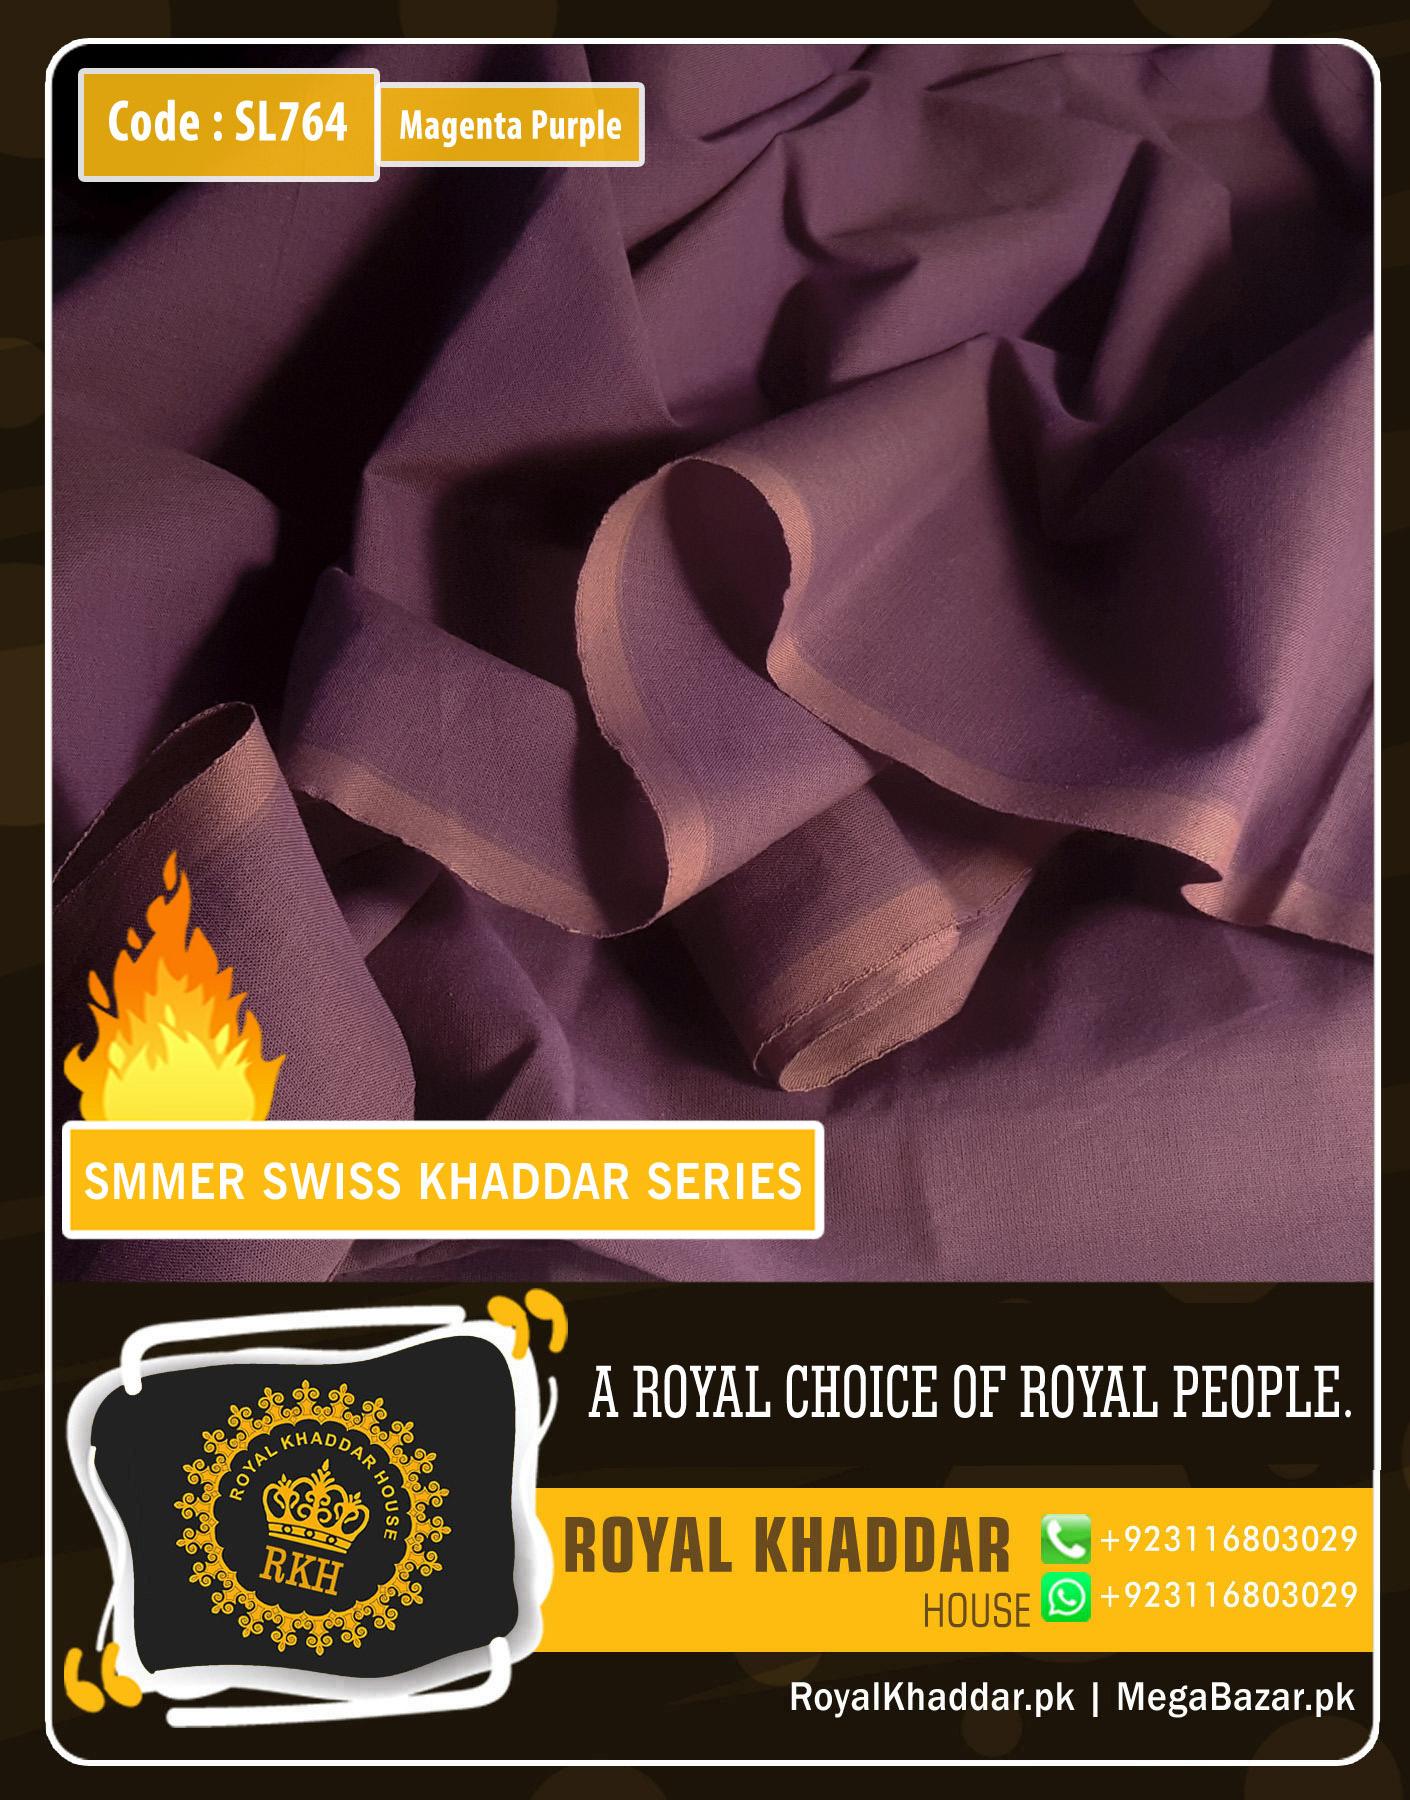 Magenta-Purple Swiss Khaddar SL764